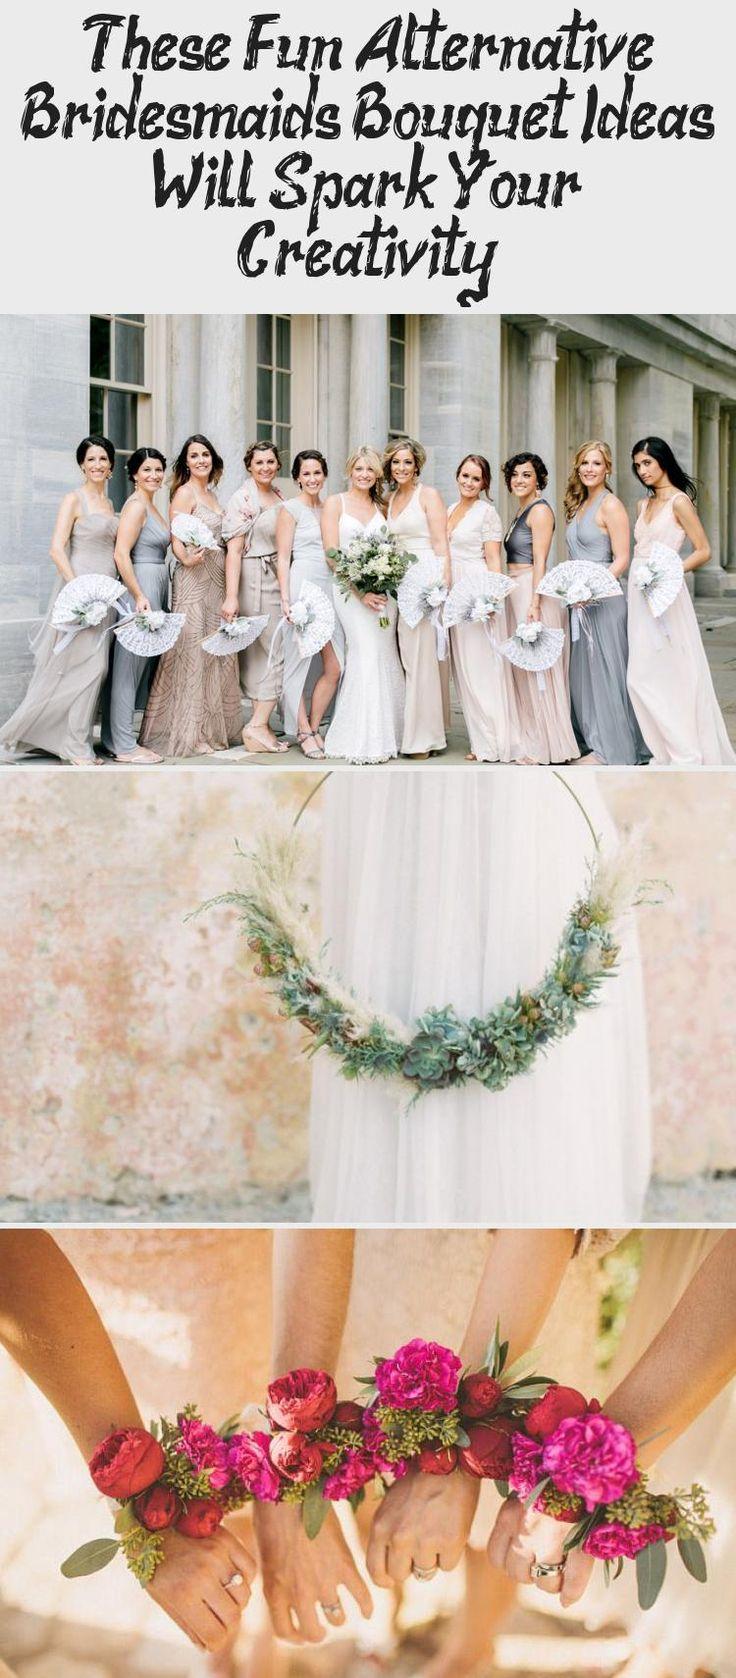 These Fun Alternative Bridesmaids Bouquet Ideas Will Spark Your Creativity! - Green Wedding Shoes #DavidsBridalBridesmaidDresses #AfricanBridesmaidDresses #BridesmaidDressesTeaLength #TanBridesmaidDresses #BlackBridesmaidDresses